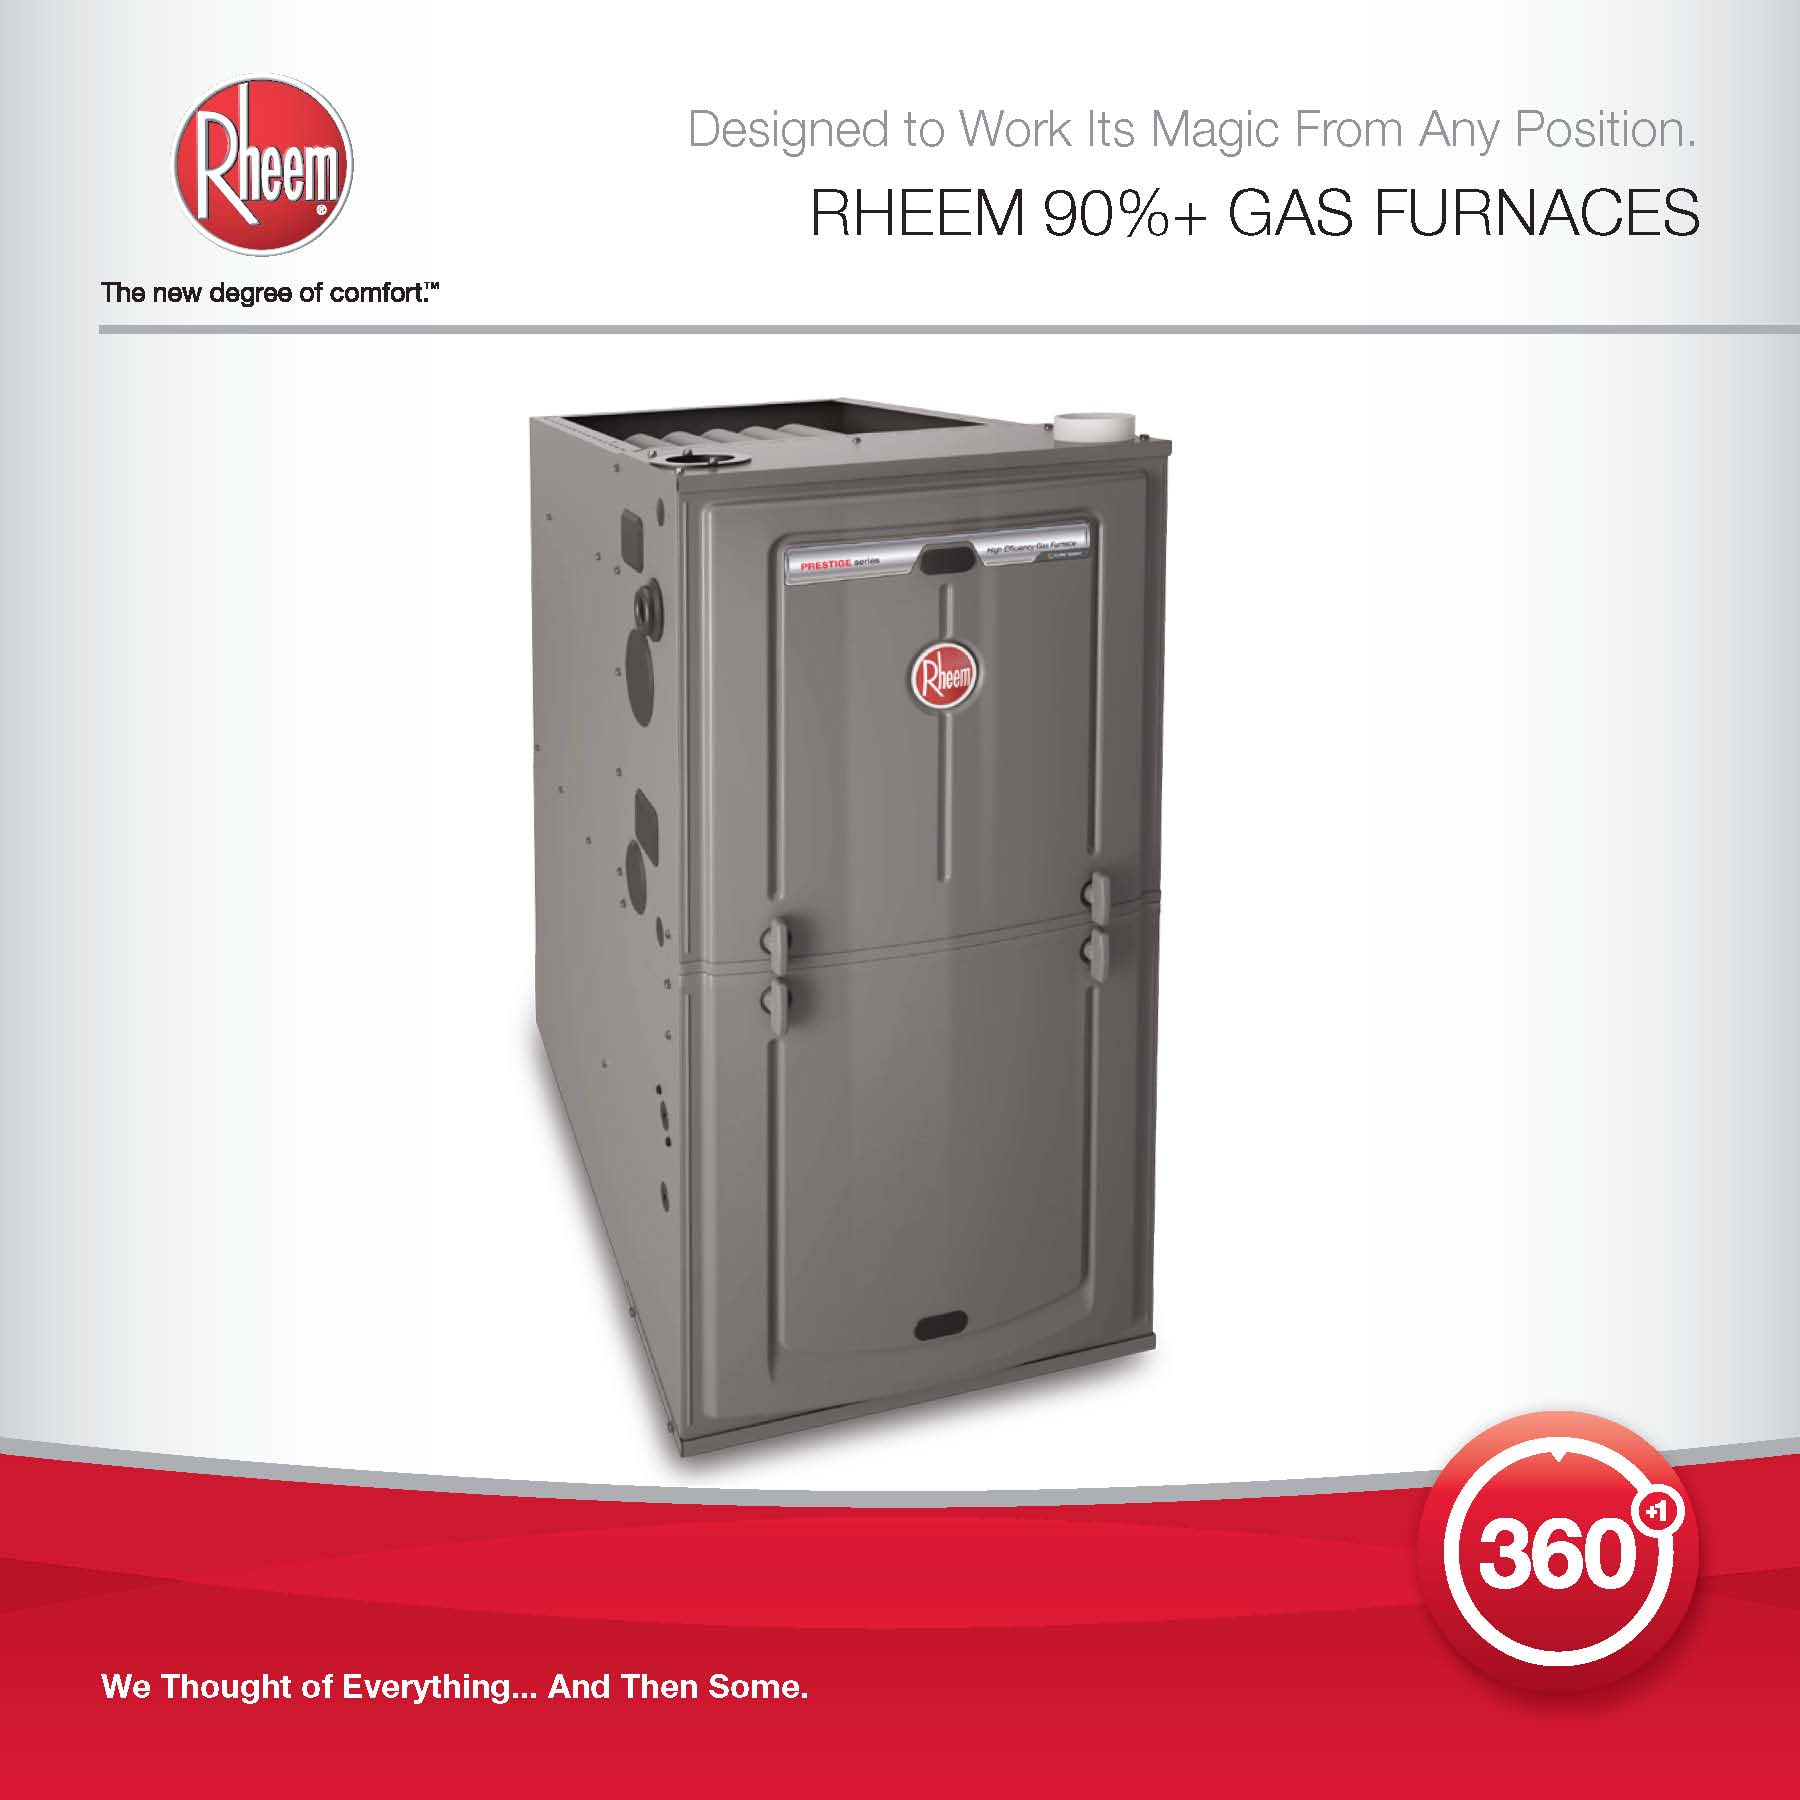 Rheem 90s Dealer Brochure_Cover rnnl rheem wiring diagram,rheem \u2022 45 63 74 91  at arjmand.co